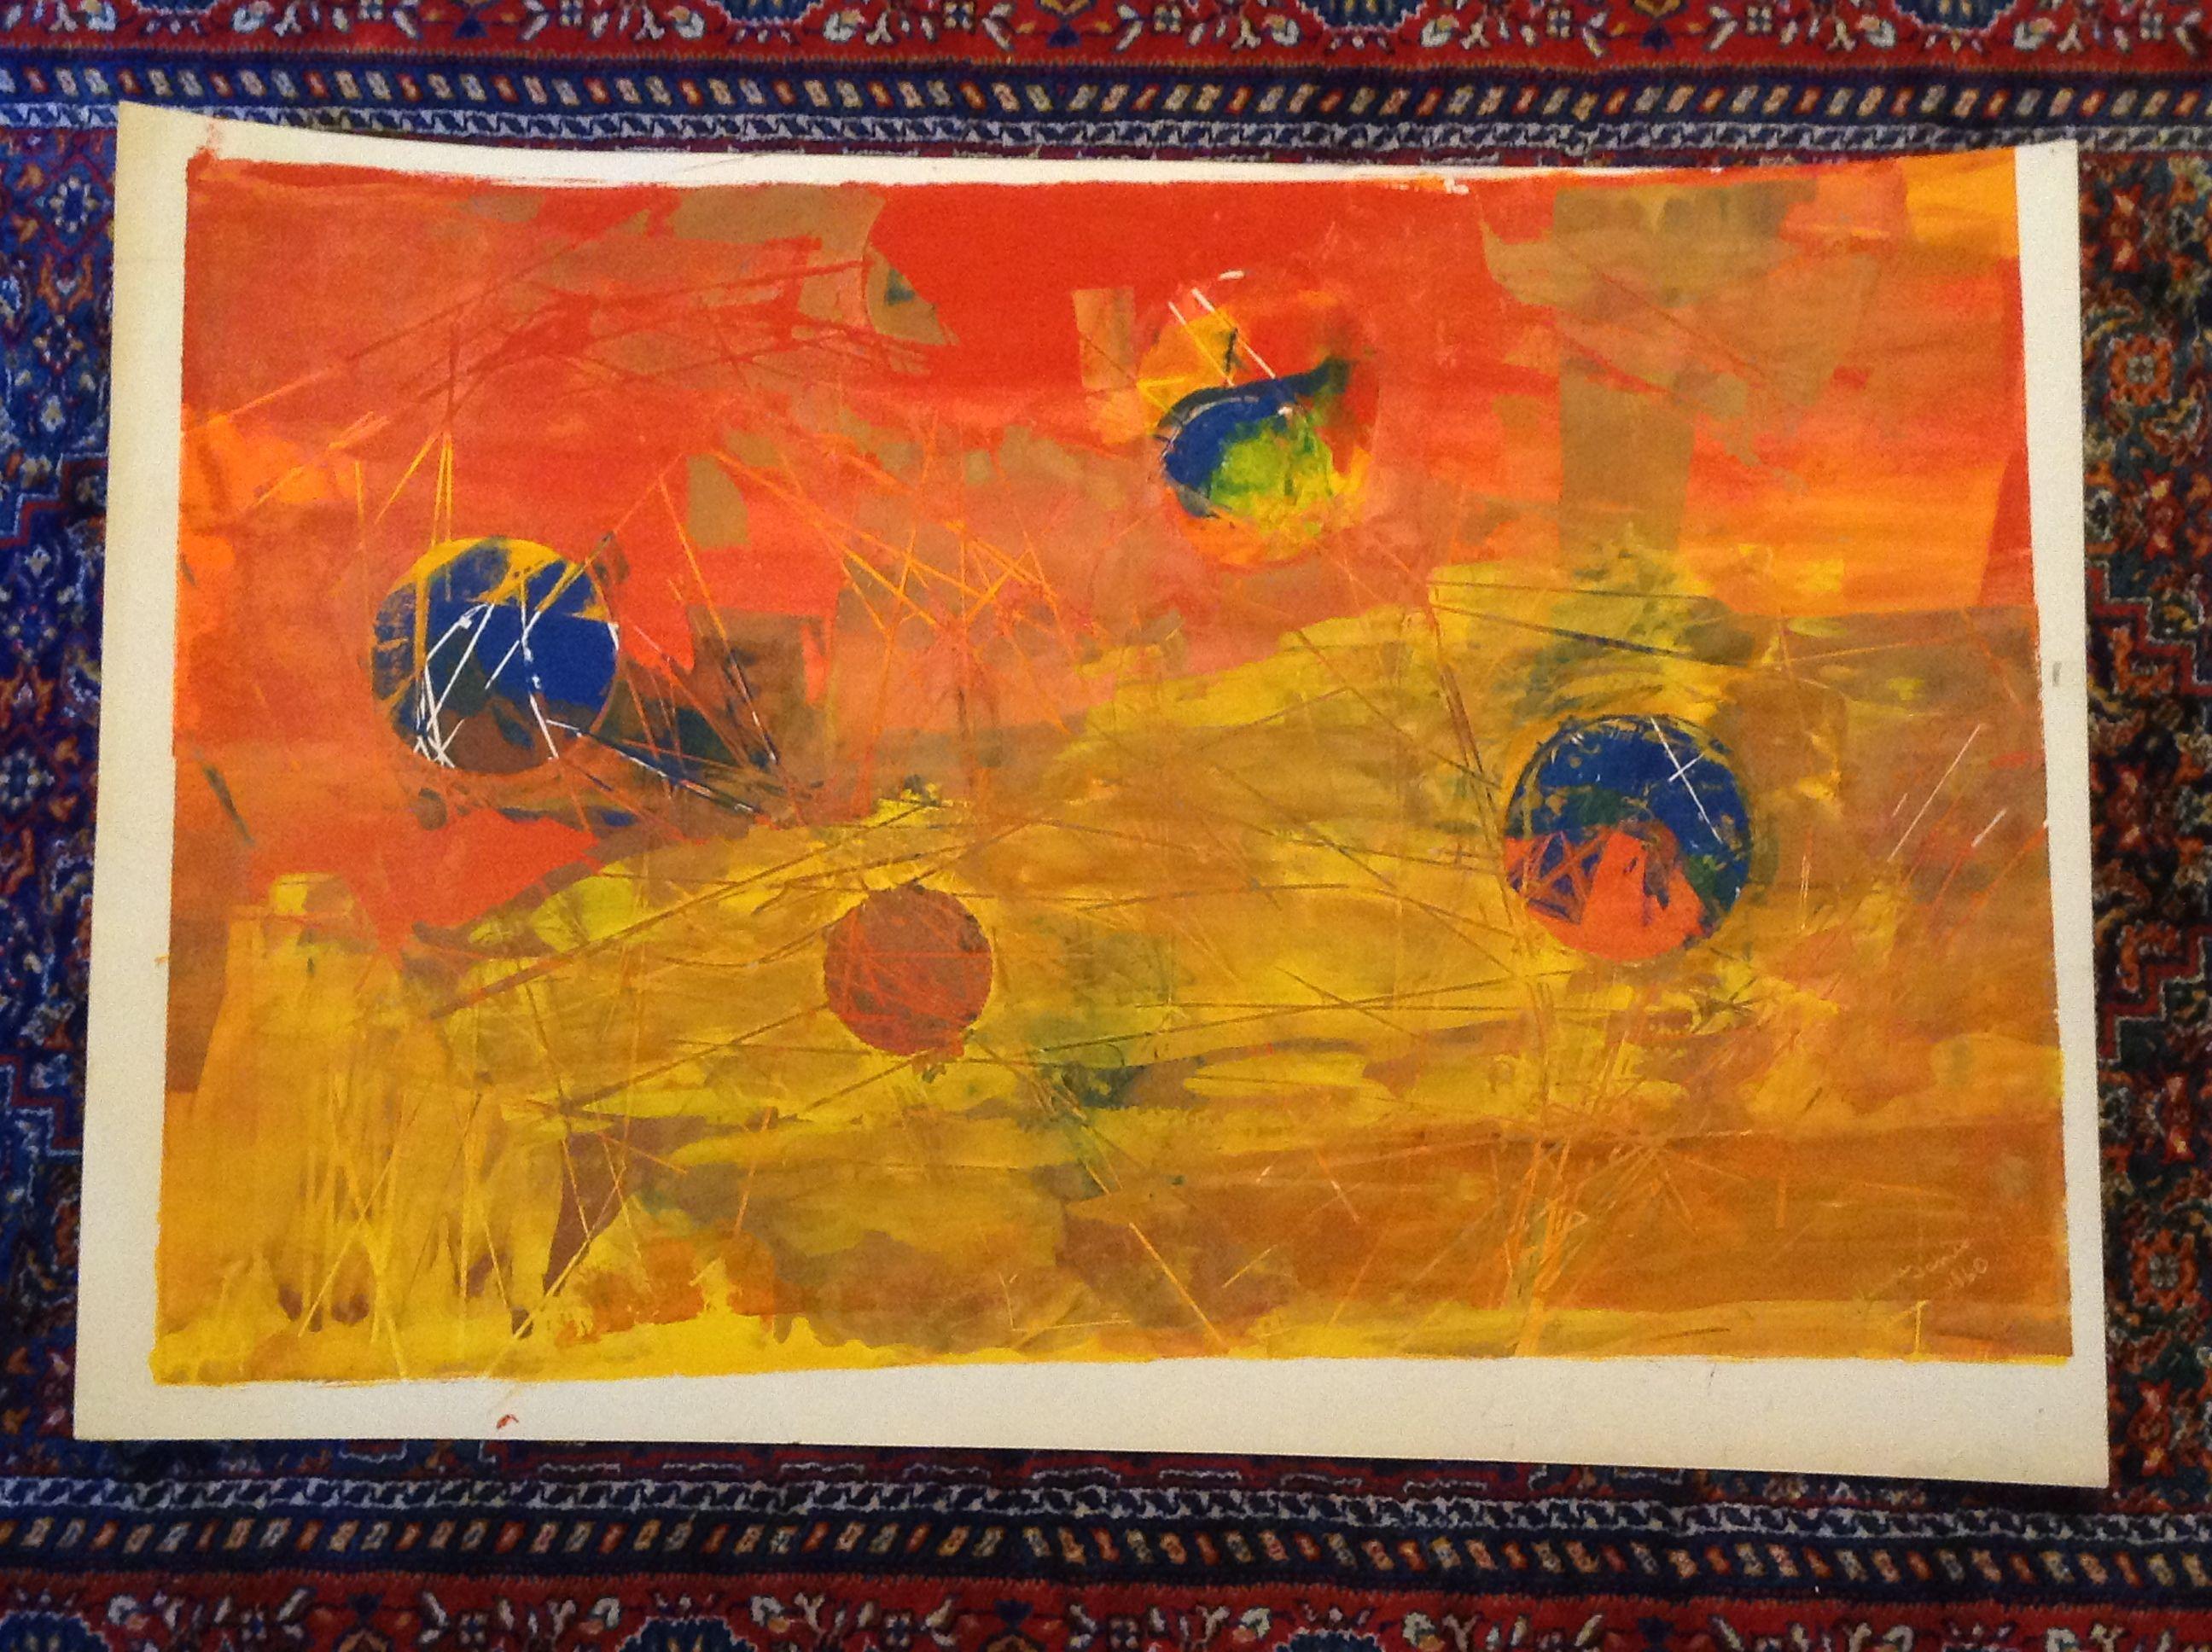 An original art piece by artist wilmer james signed and